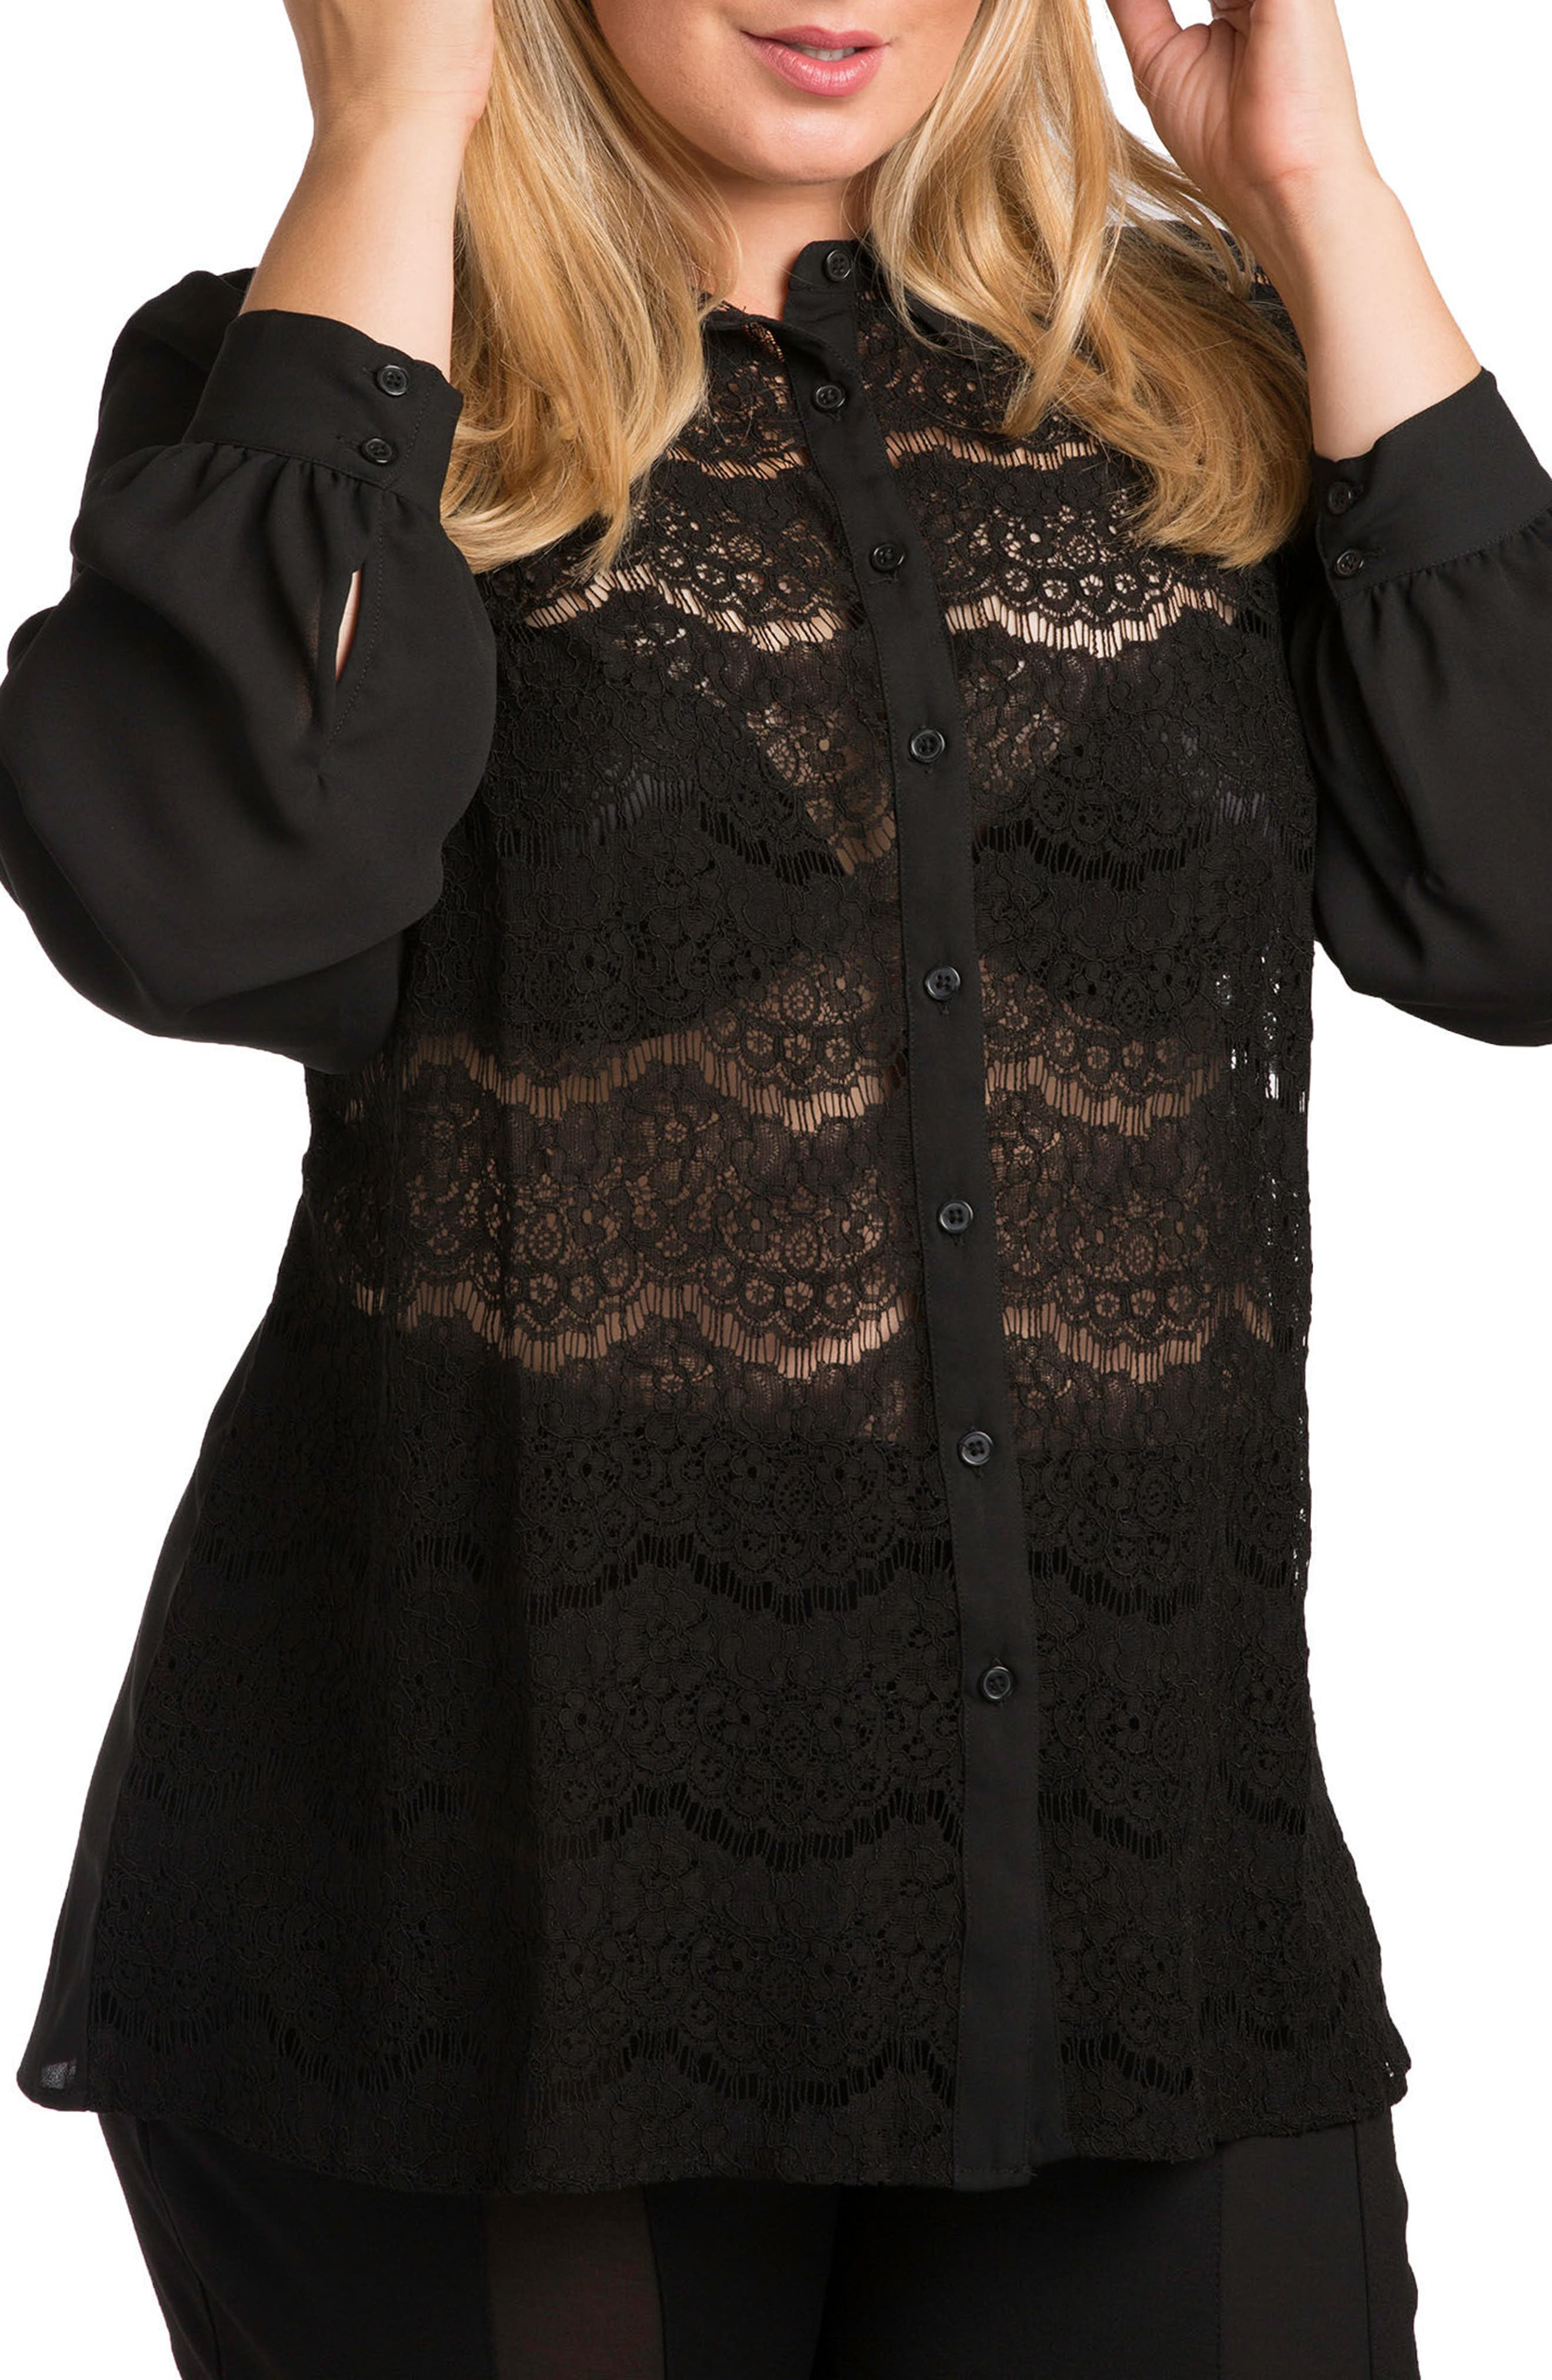 Coco Lace Front Shirt,                             Main thumbnail 1, color,                             BLACK